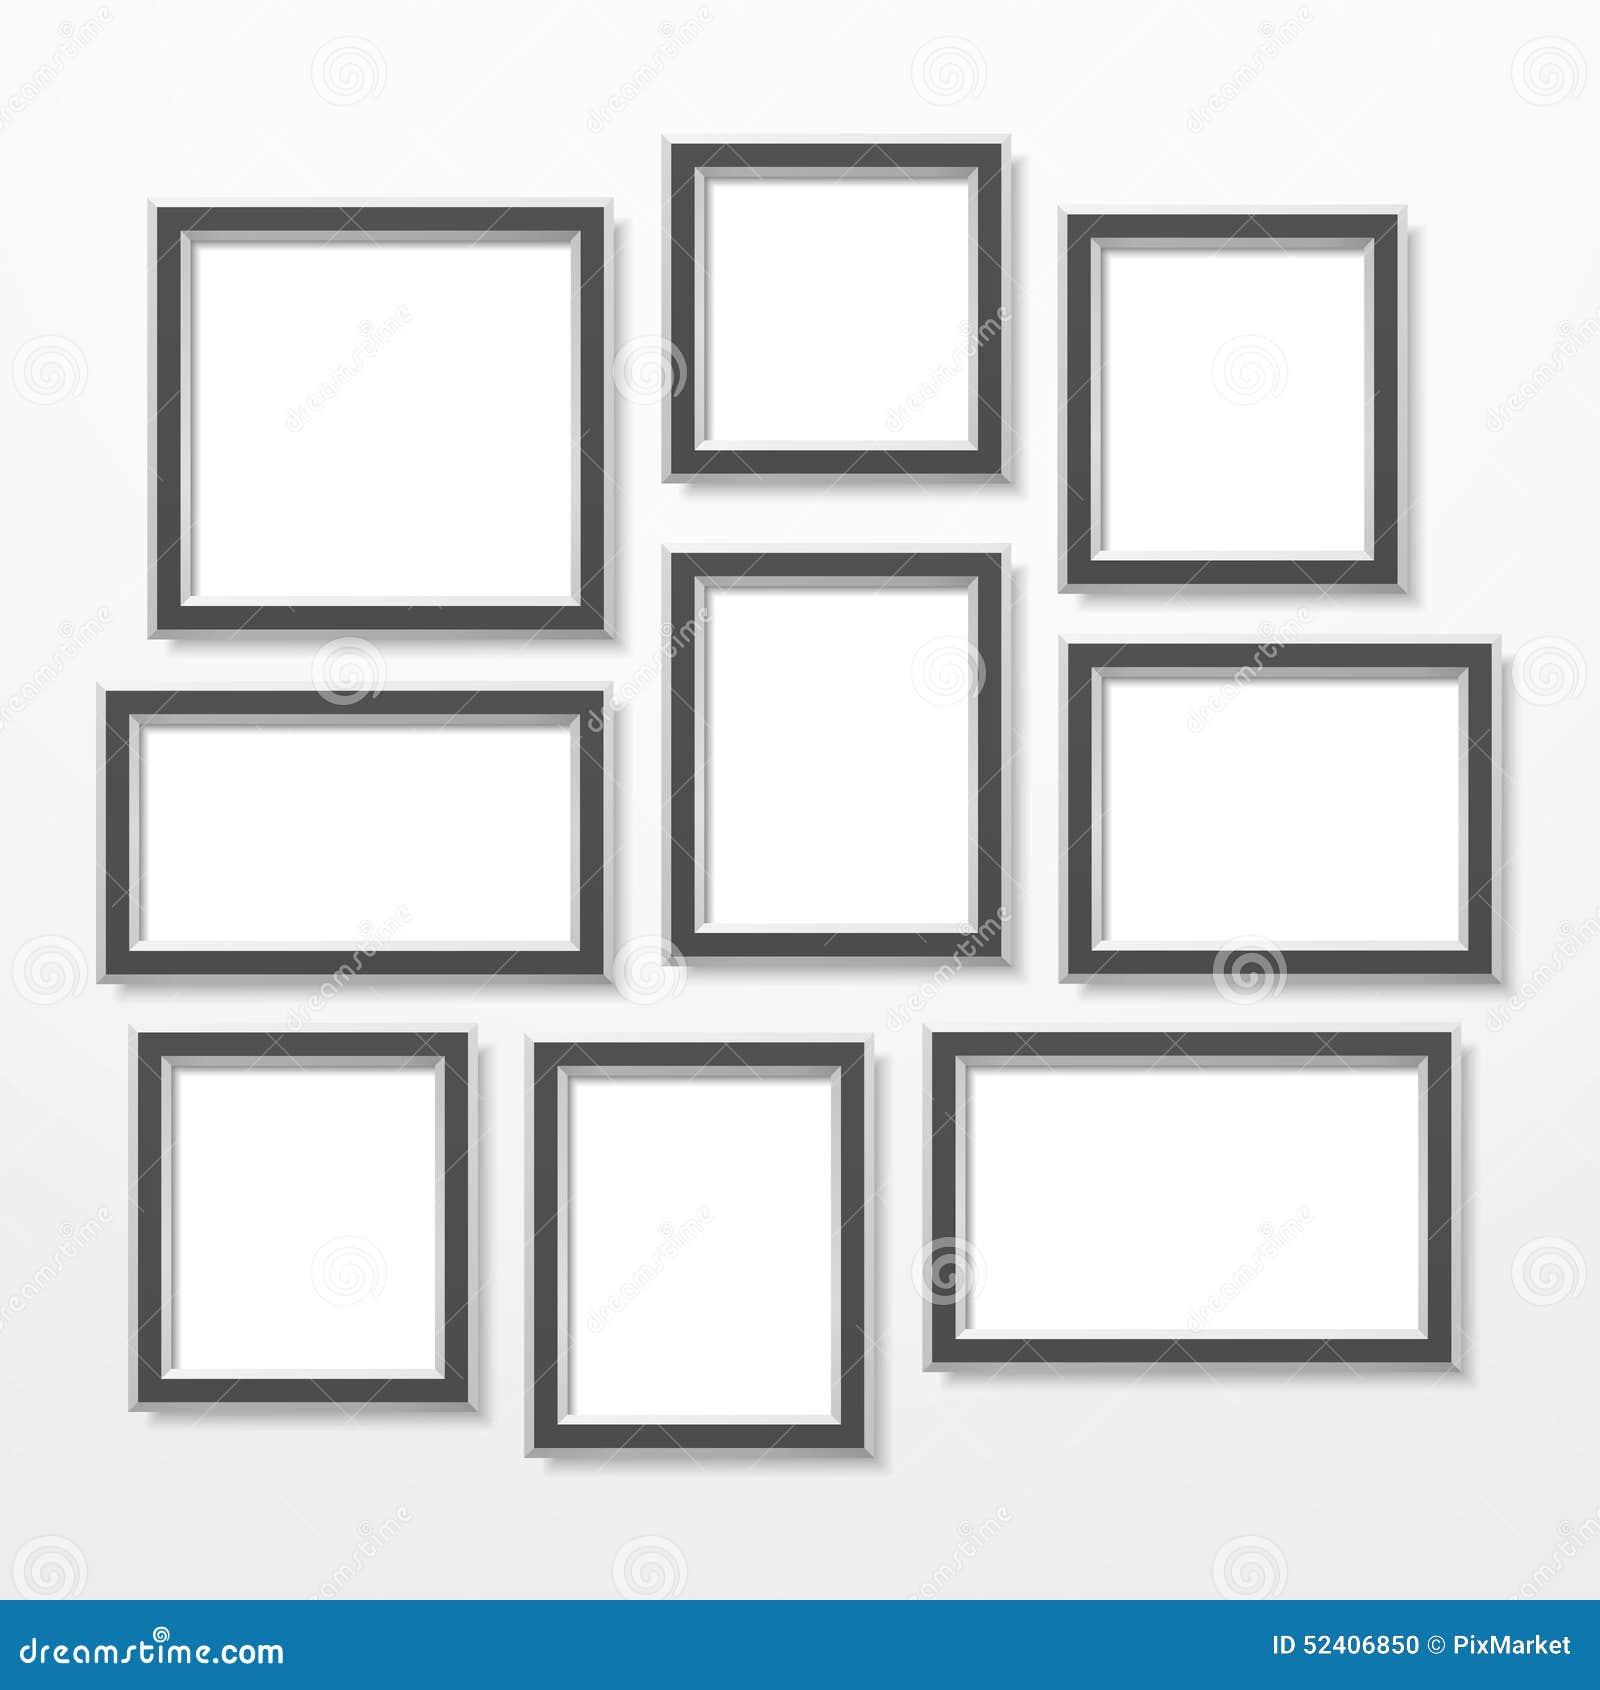 Frames stock vector. Illustration of frames, gray, horizontal - 52406850